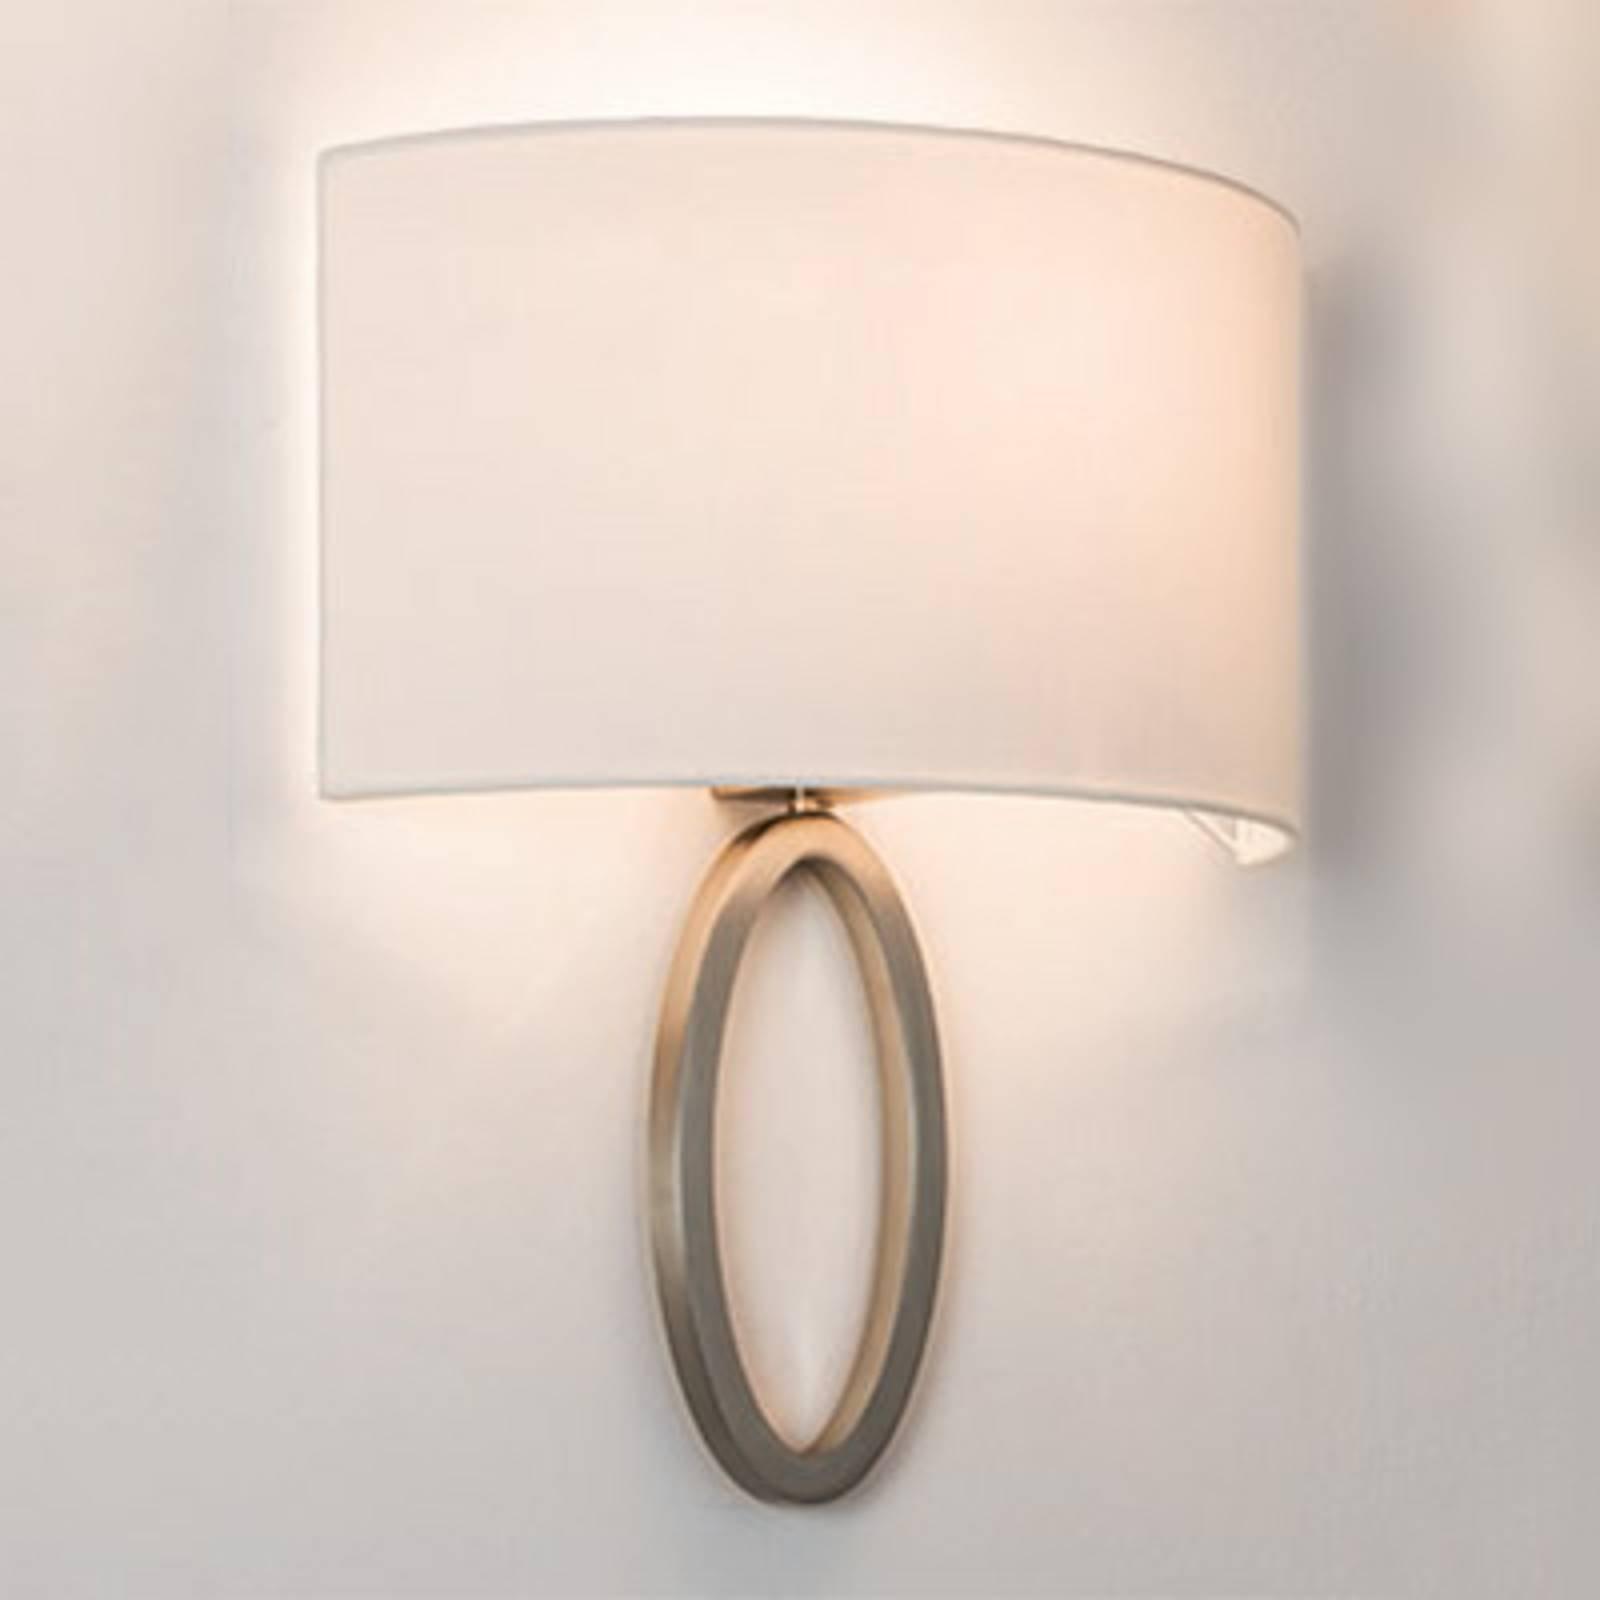 Elegant fabric wall light Lima in white